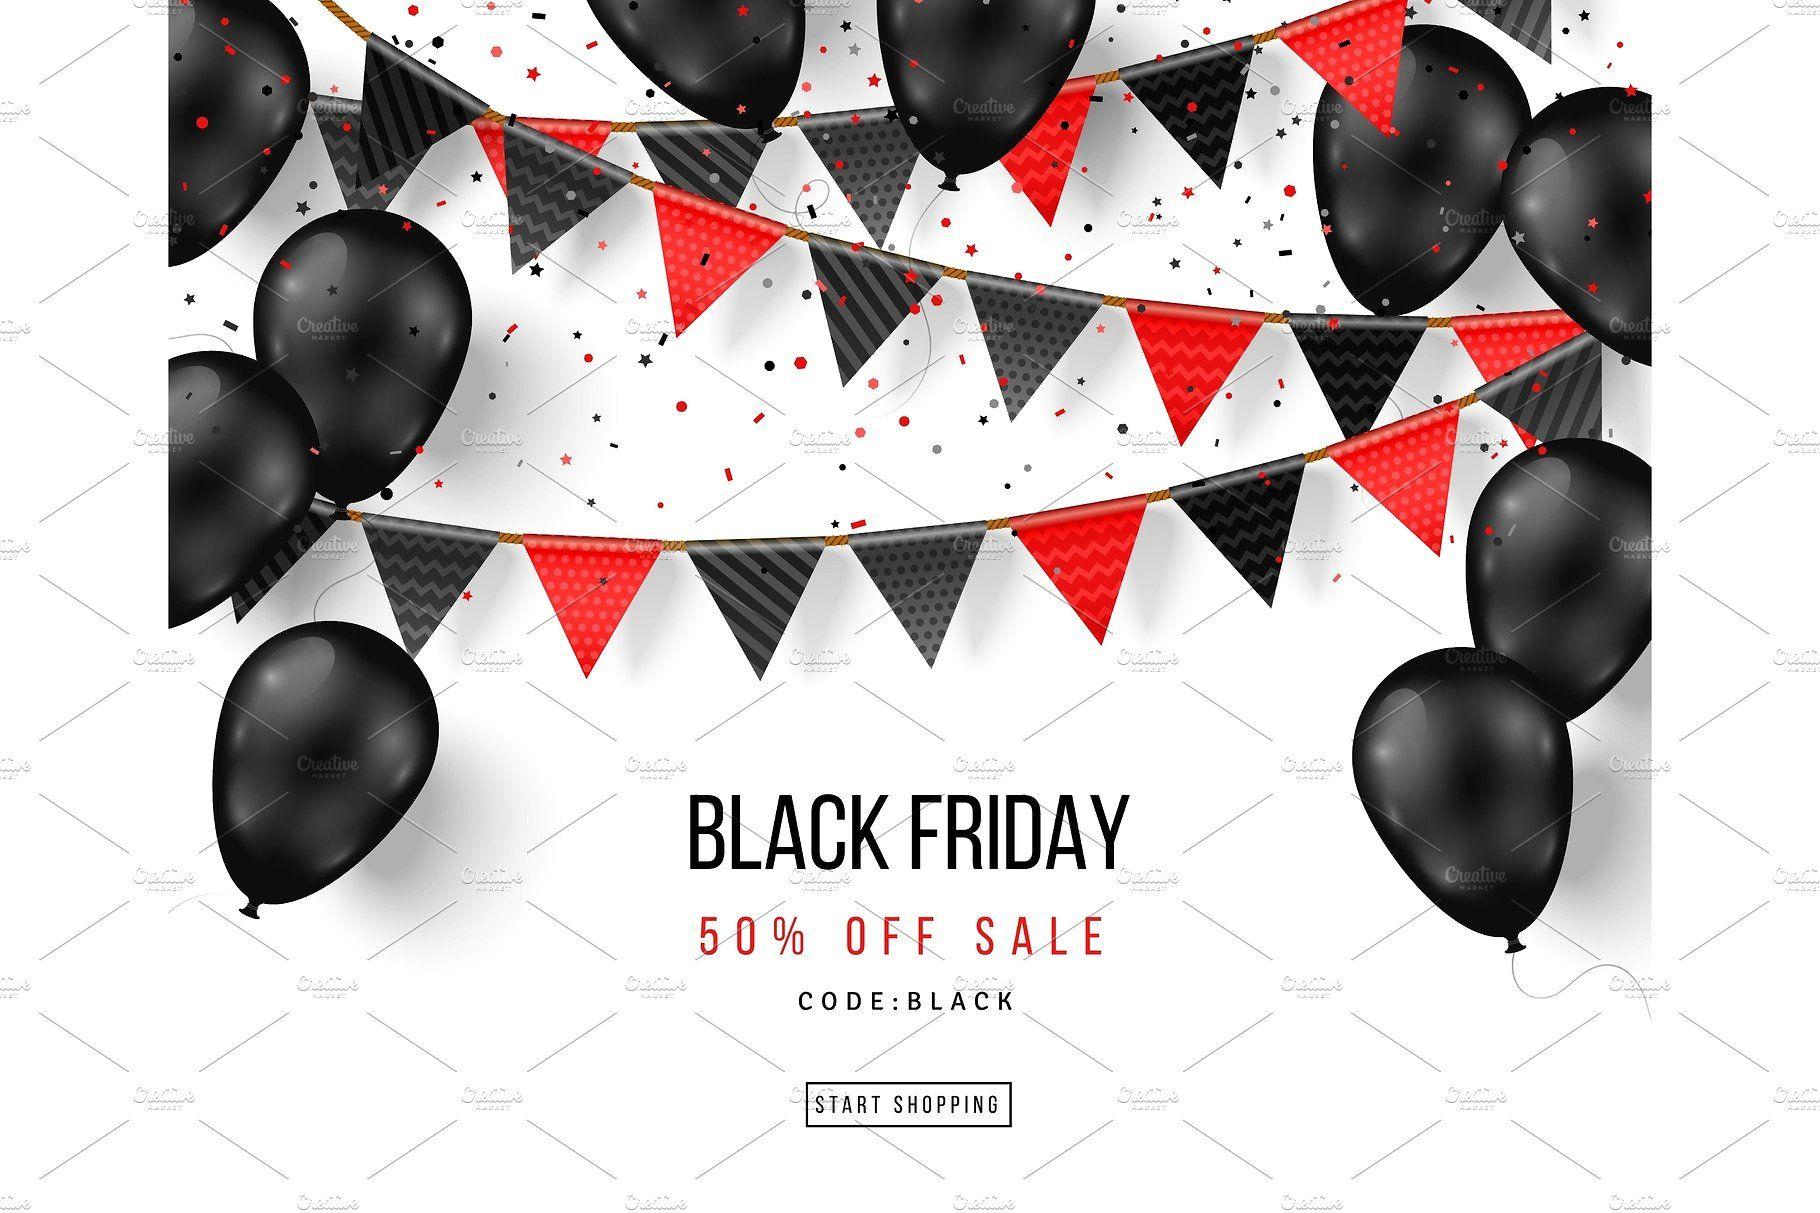 Black Friday Balloons And Garlands Black Friday Banner Black Friday Sale Poster Black Friday Art